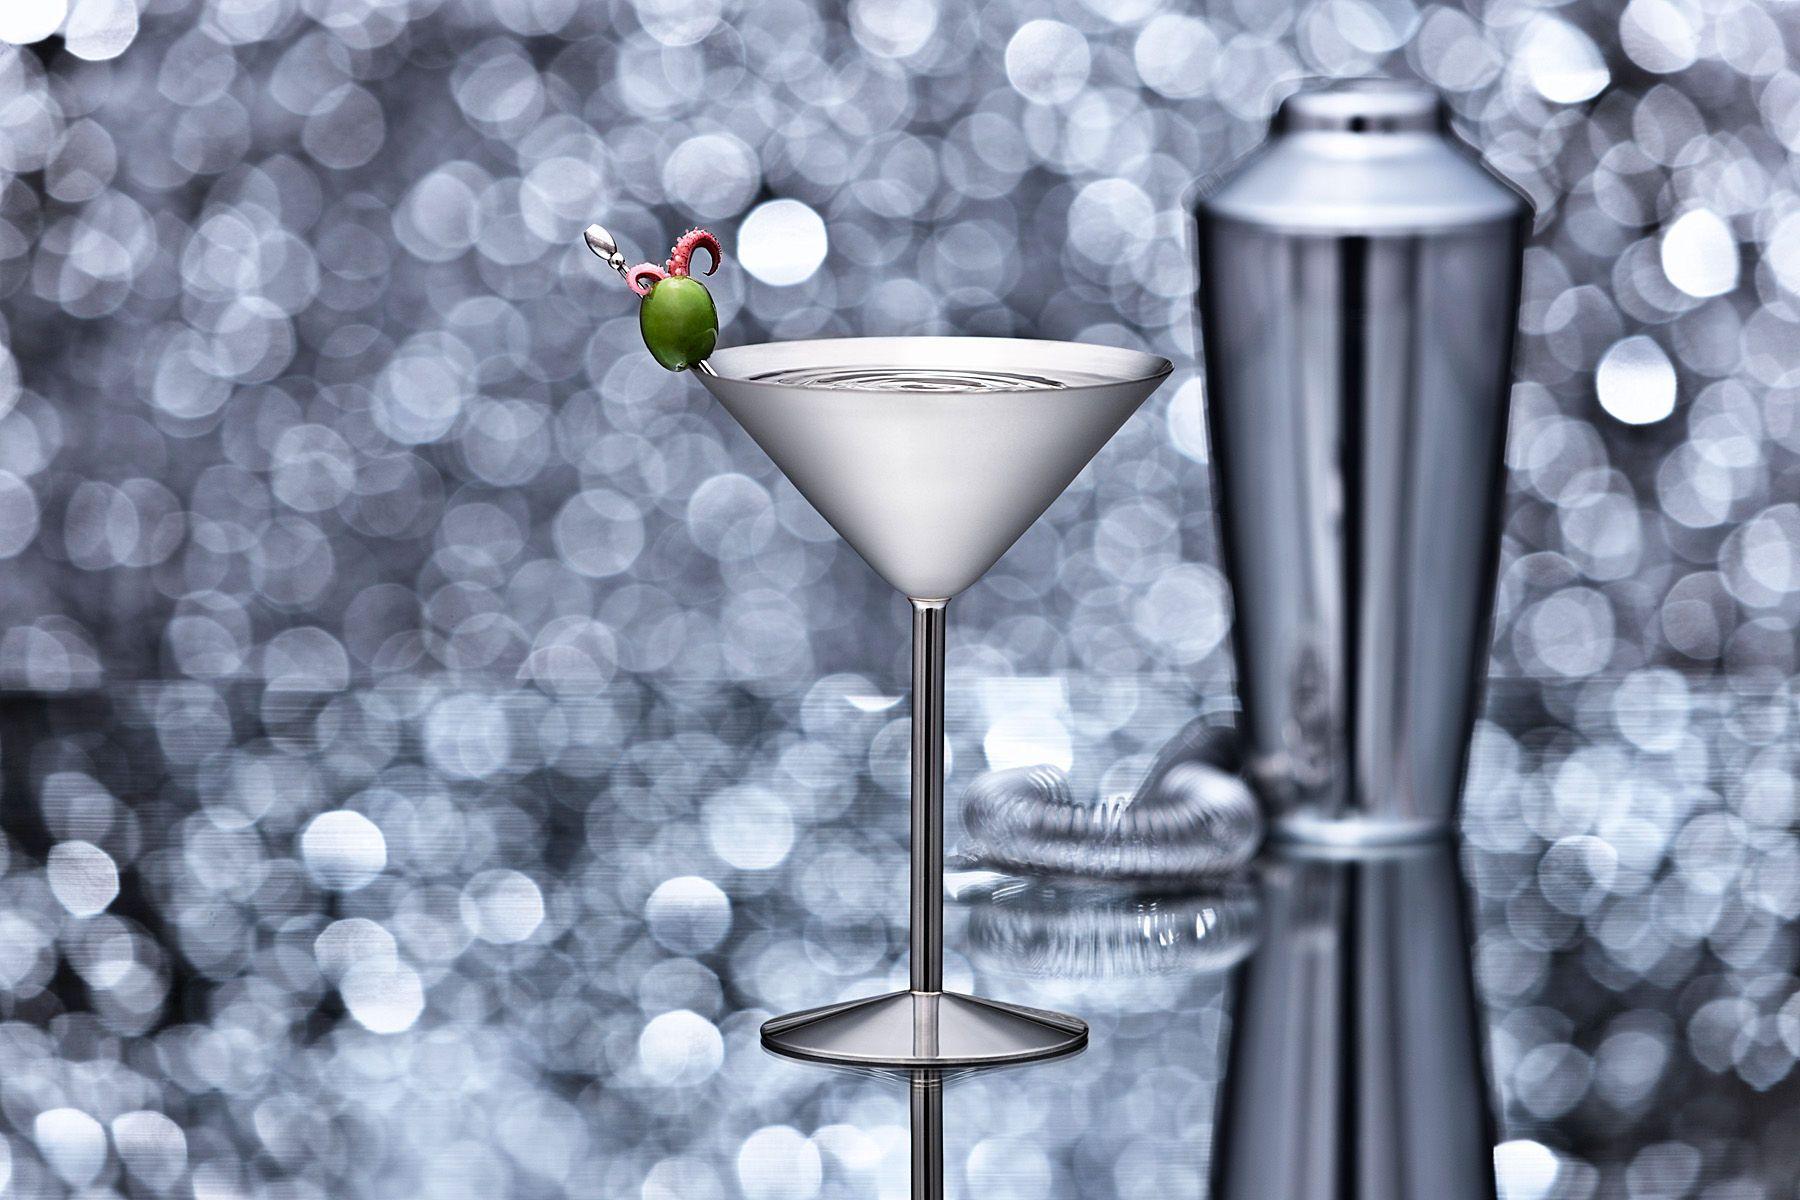 1brian_demello_photography_advertising_product_food_liquids_beverage_portrait_beauty_athletic_sports_0428_vm_006_copy.jpg